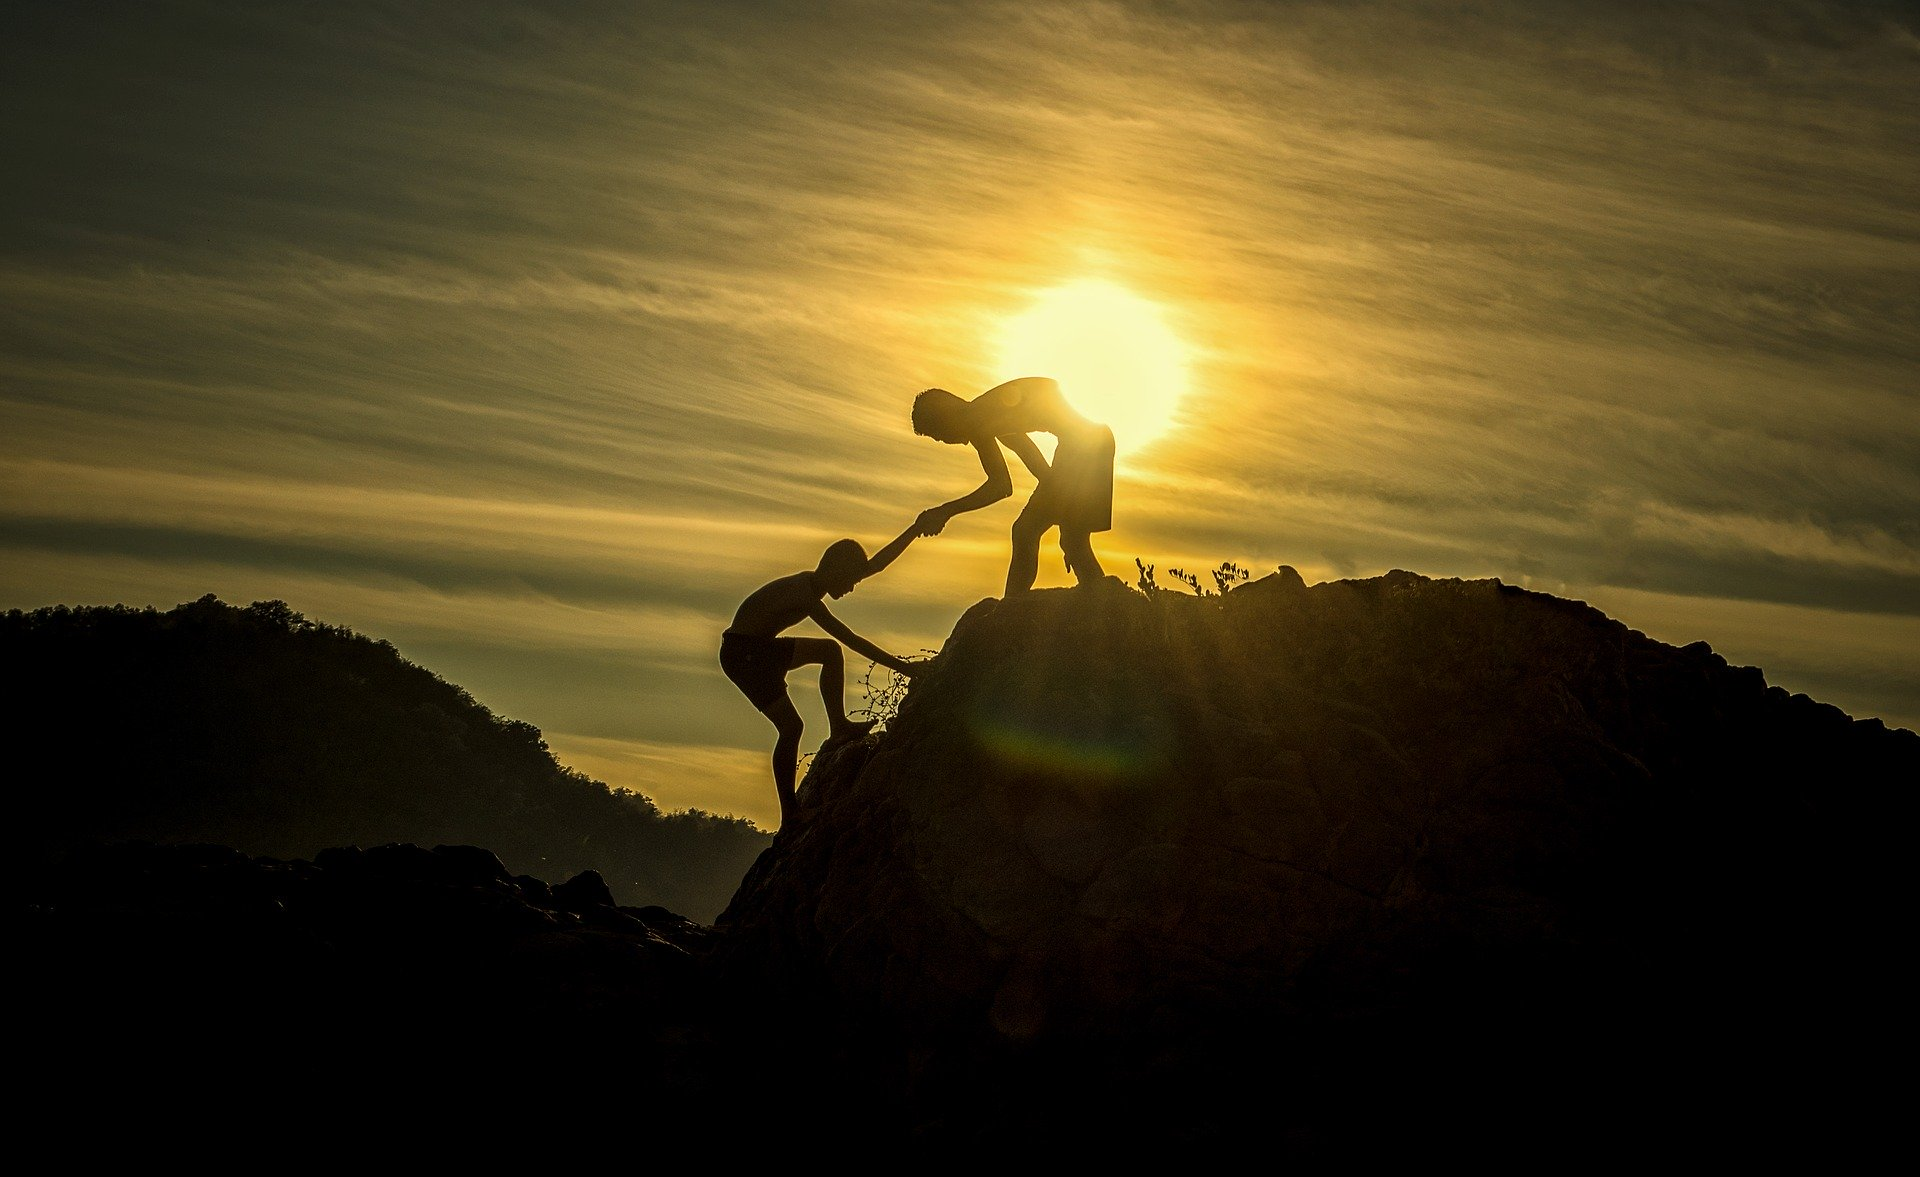 Berg Anstieg Hilfe